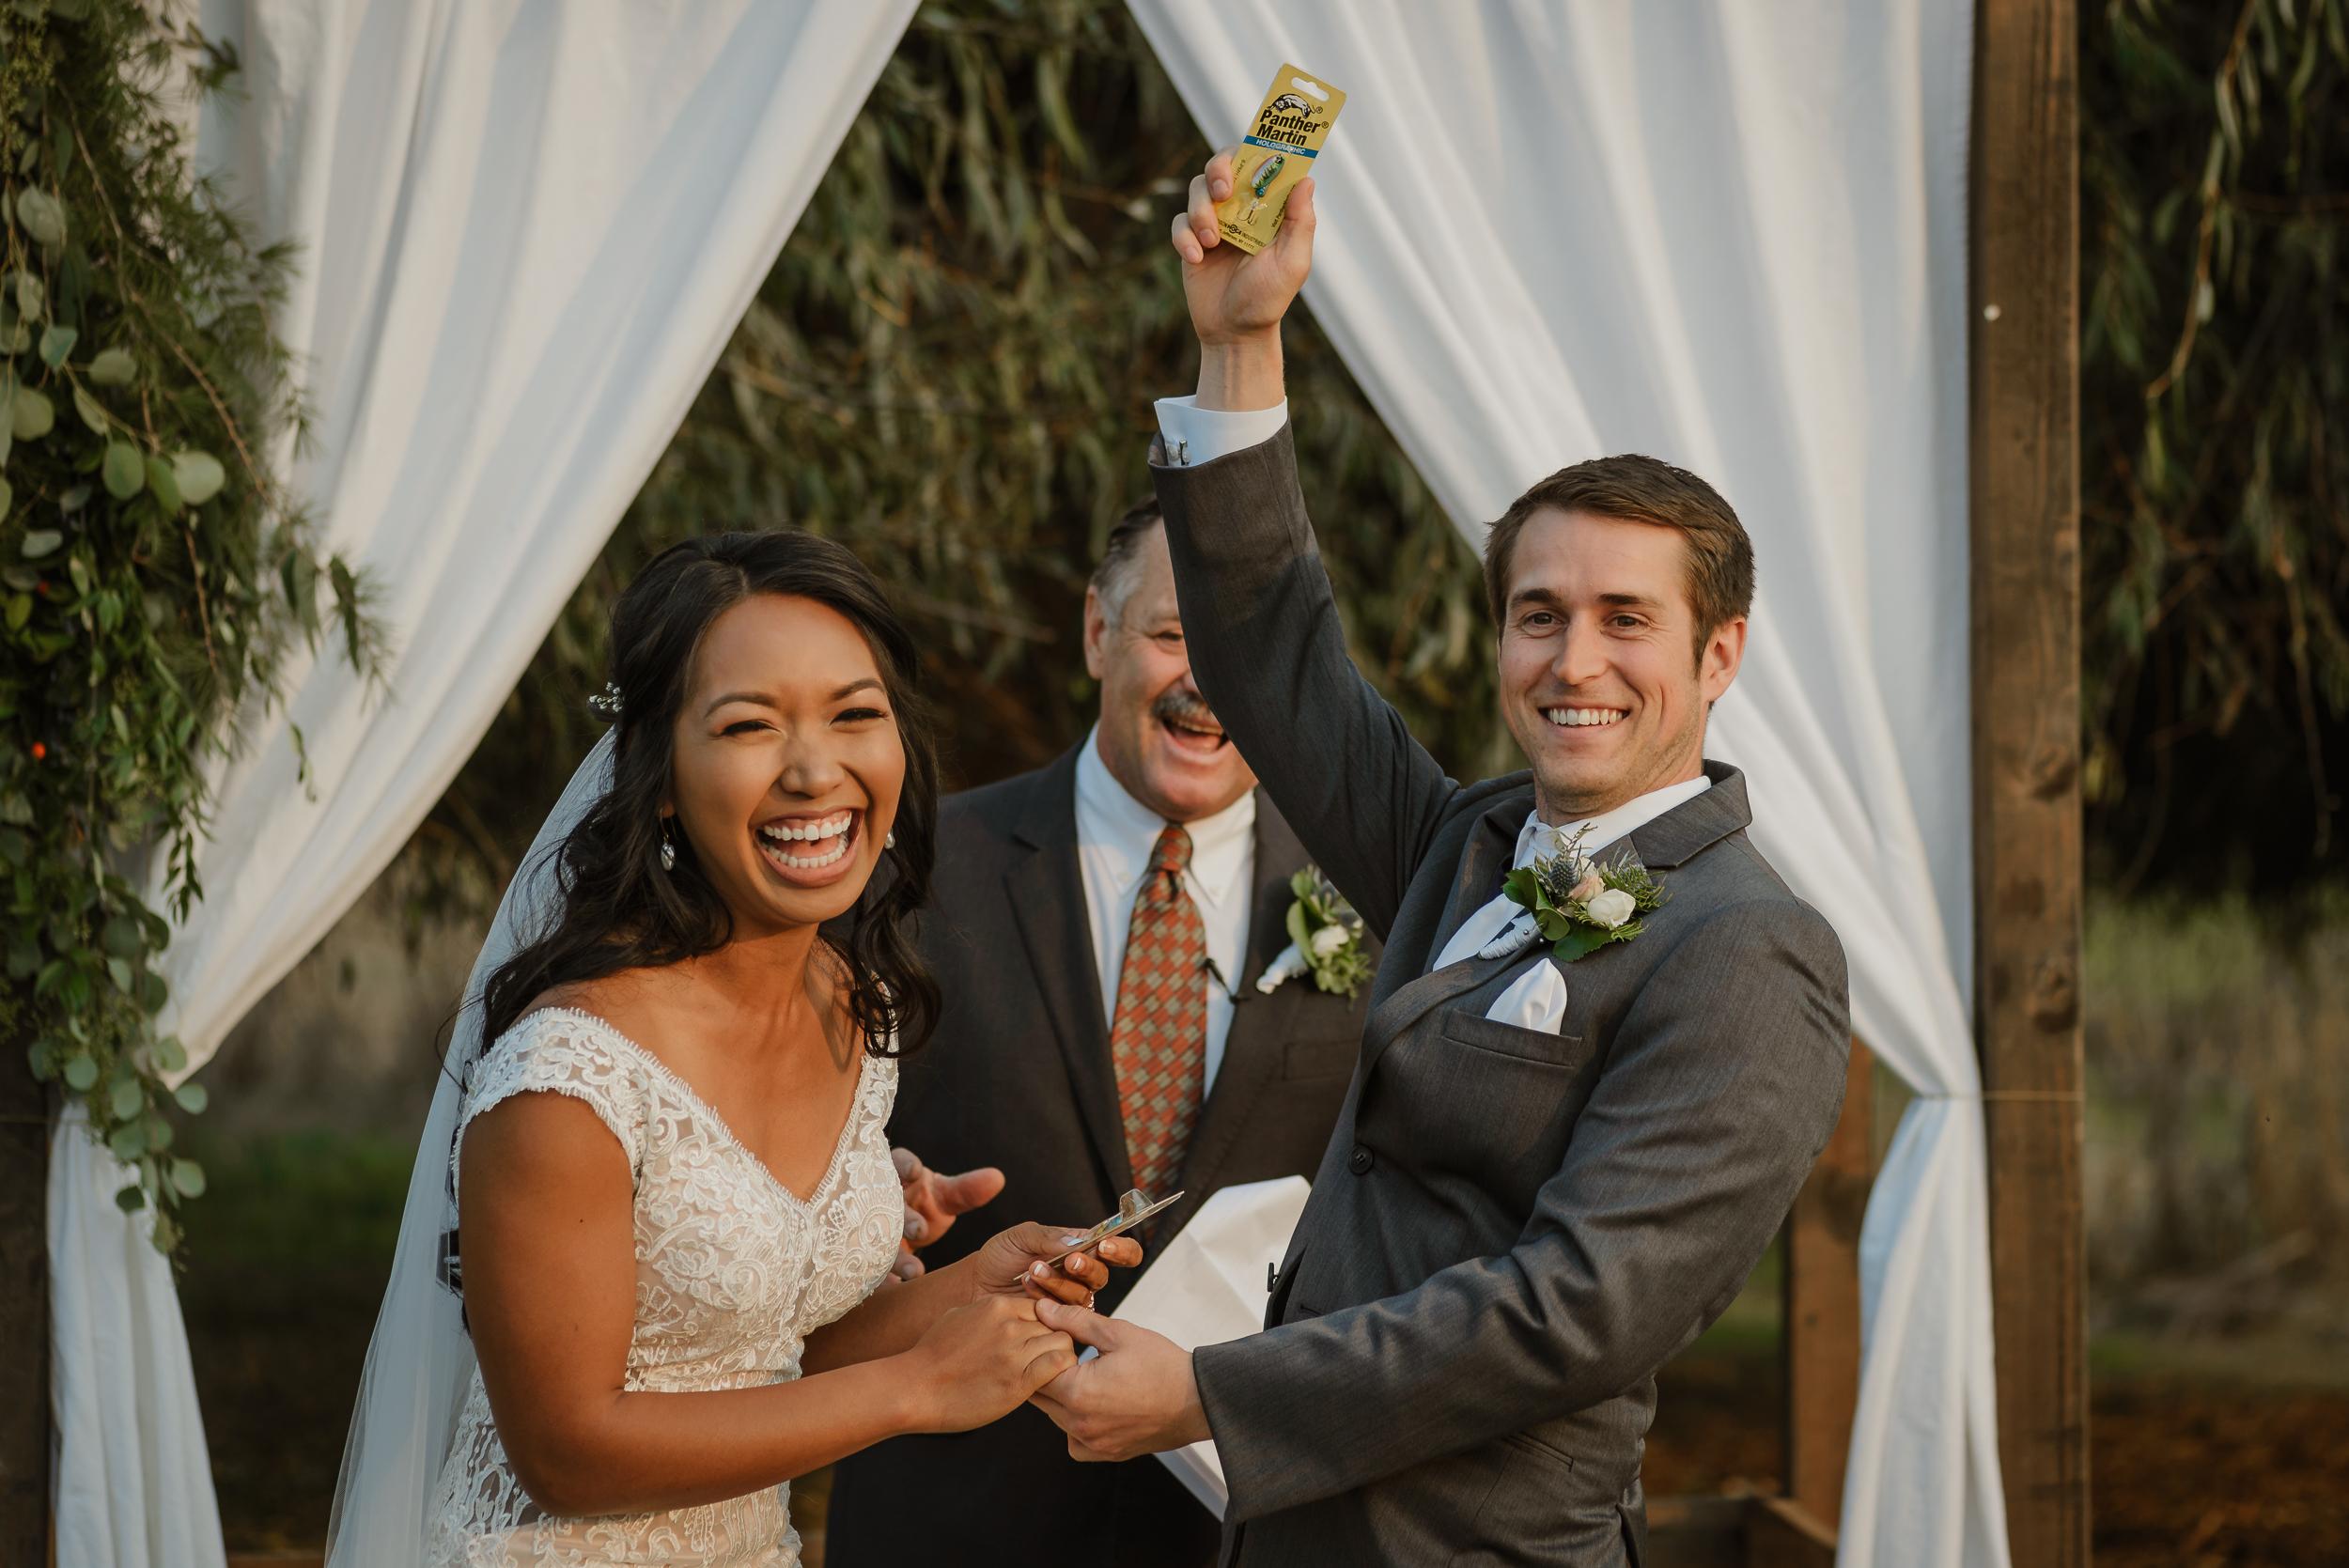 044marin-petaluma-backyard-wedding-vivianchen-283.jpg